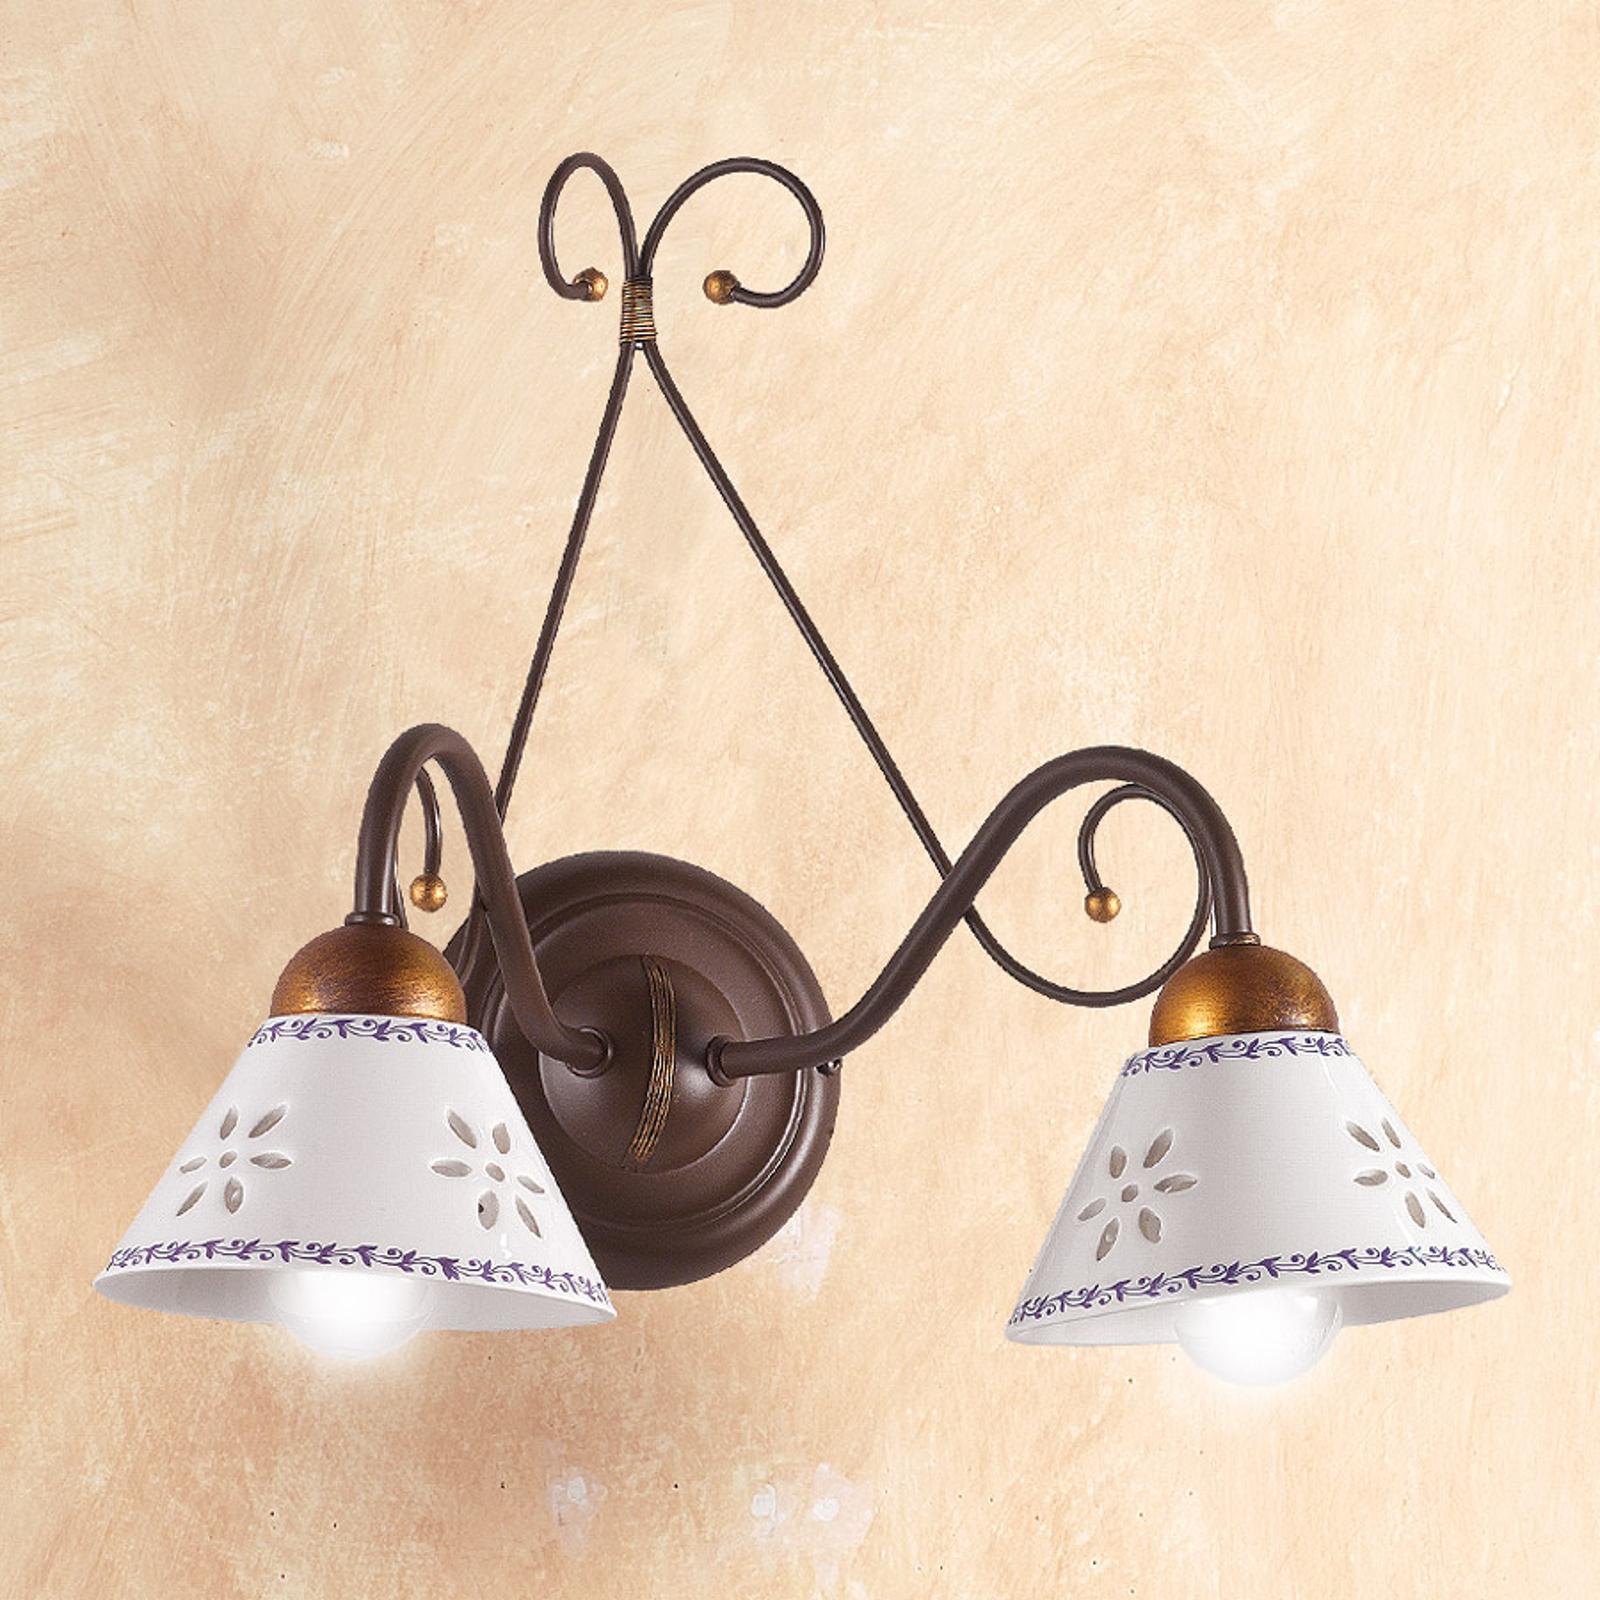 2-bulb LIBERTY wall light_2013036_1